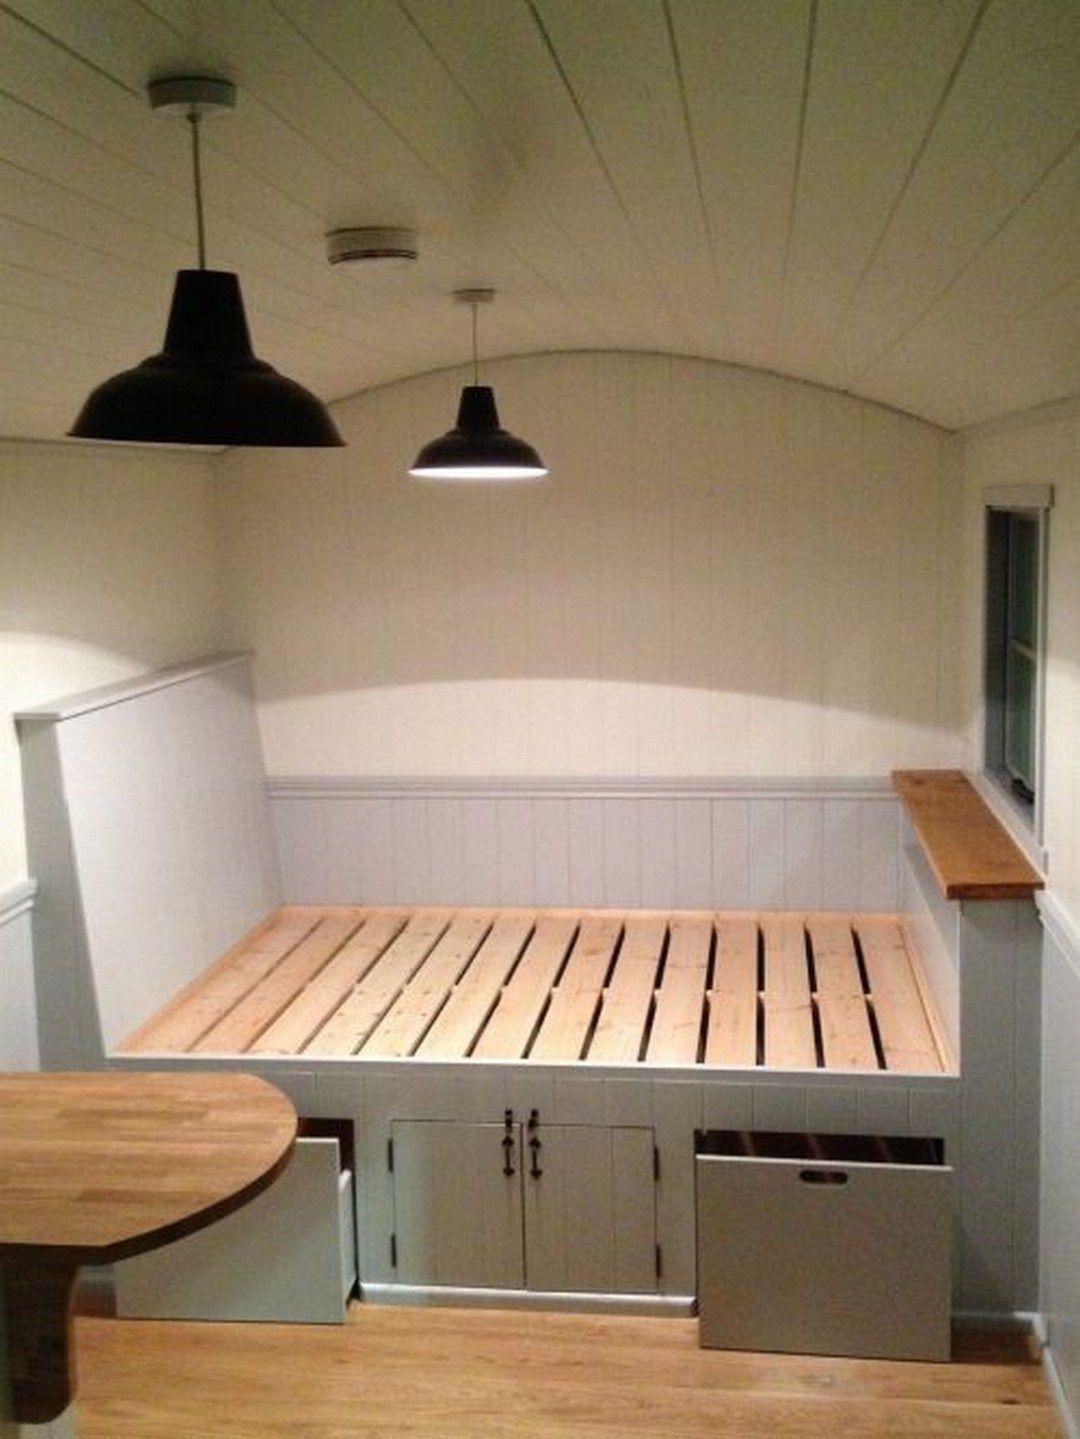 Shepherds Hut Interior Plans For Holidays 99 Ideas You Shoul